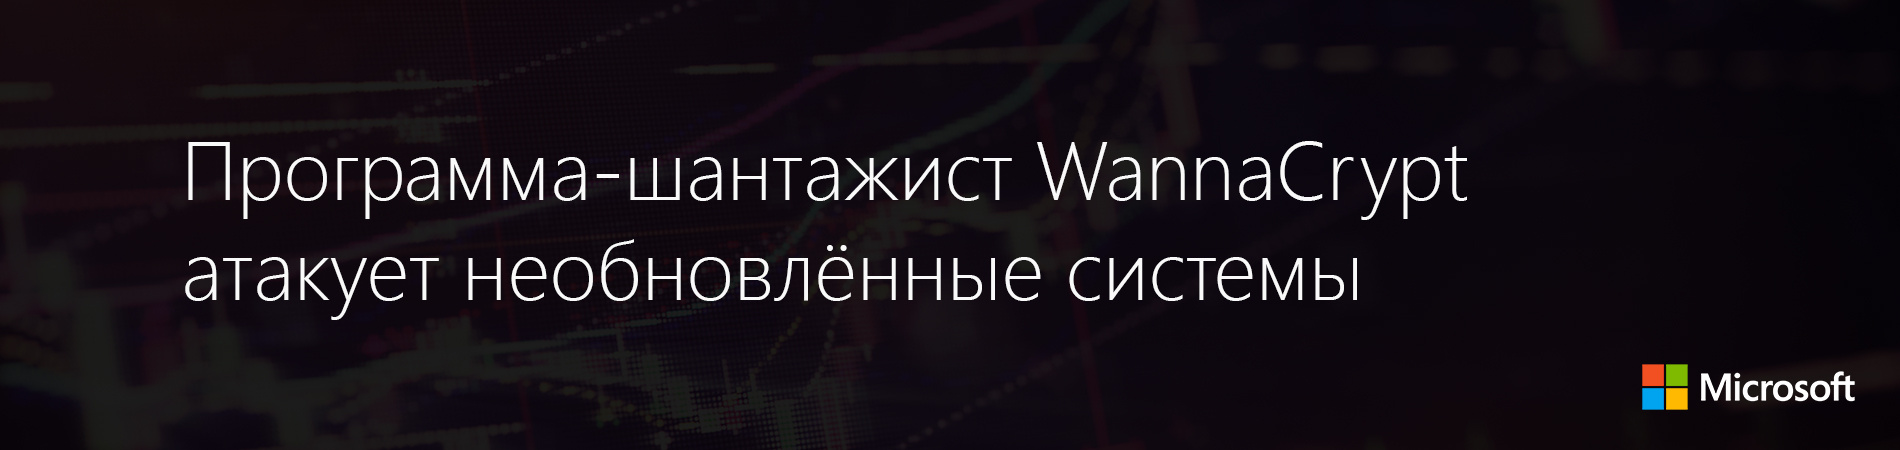 Программа-шантажист WannaCrypt атакует необновлённые системы